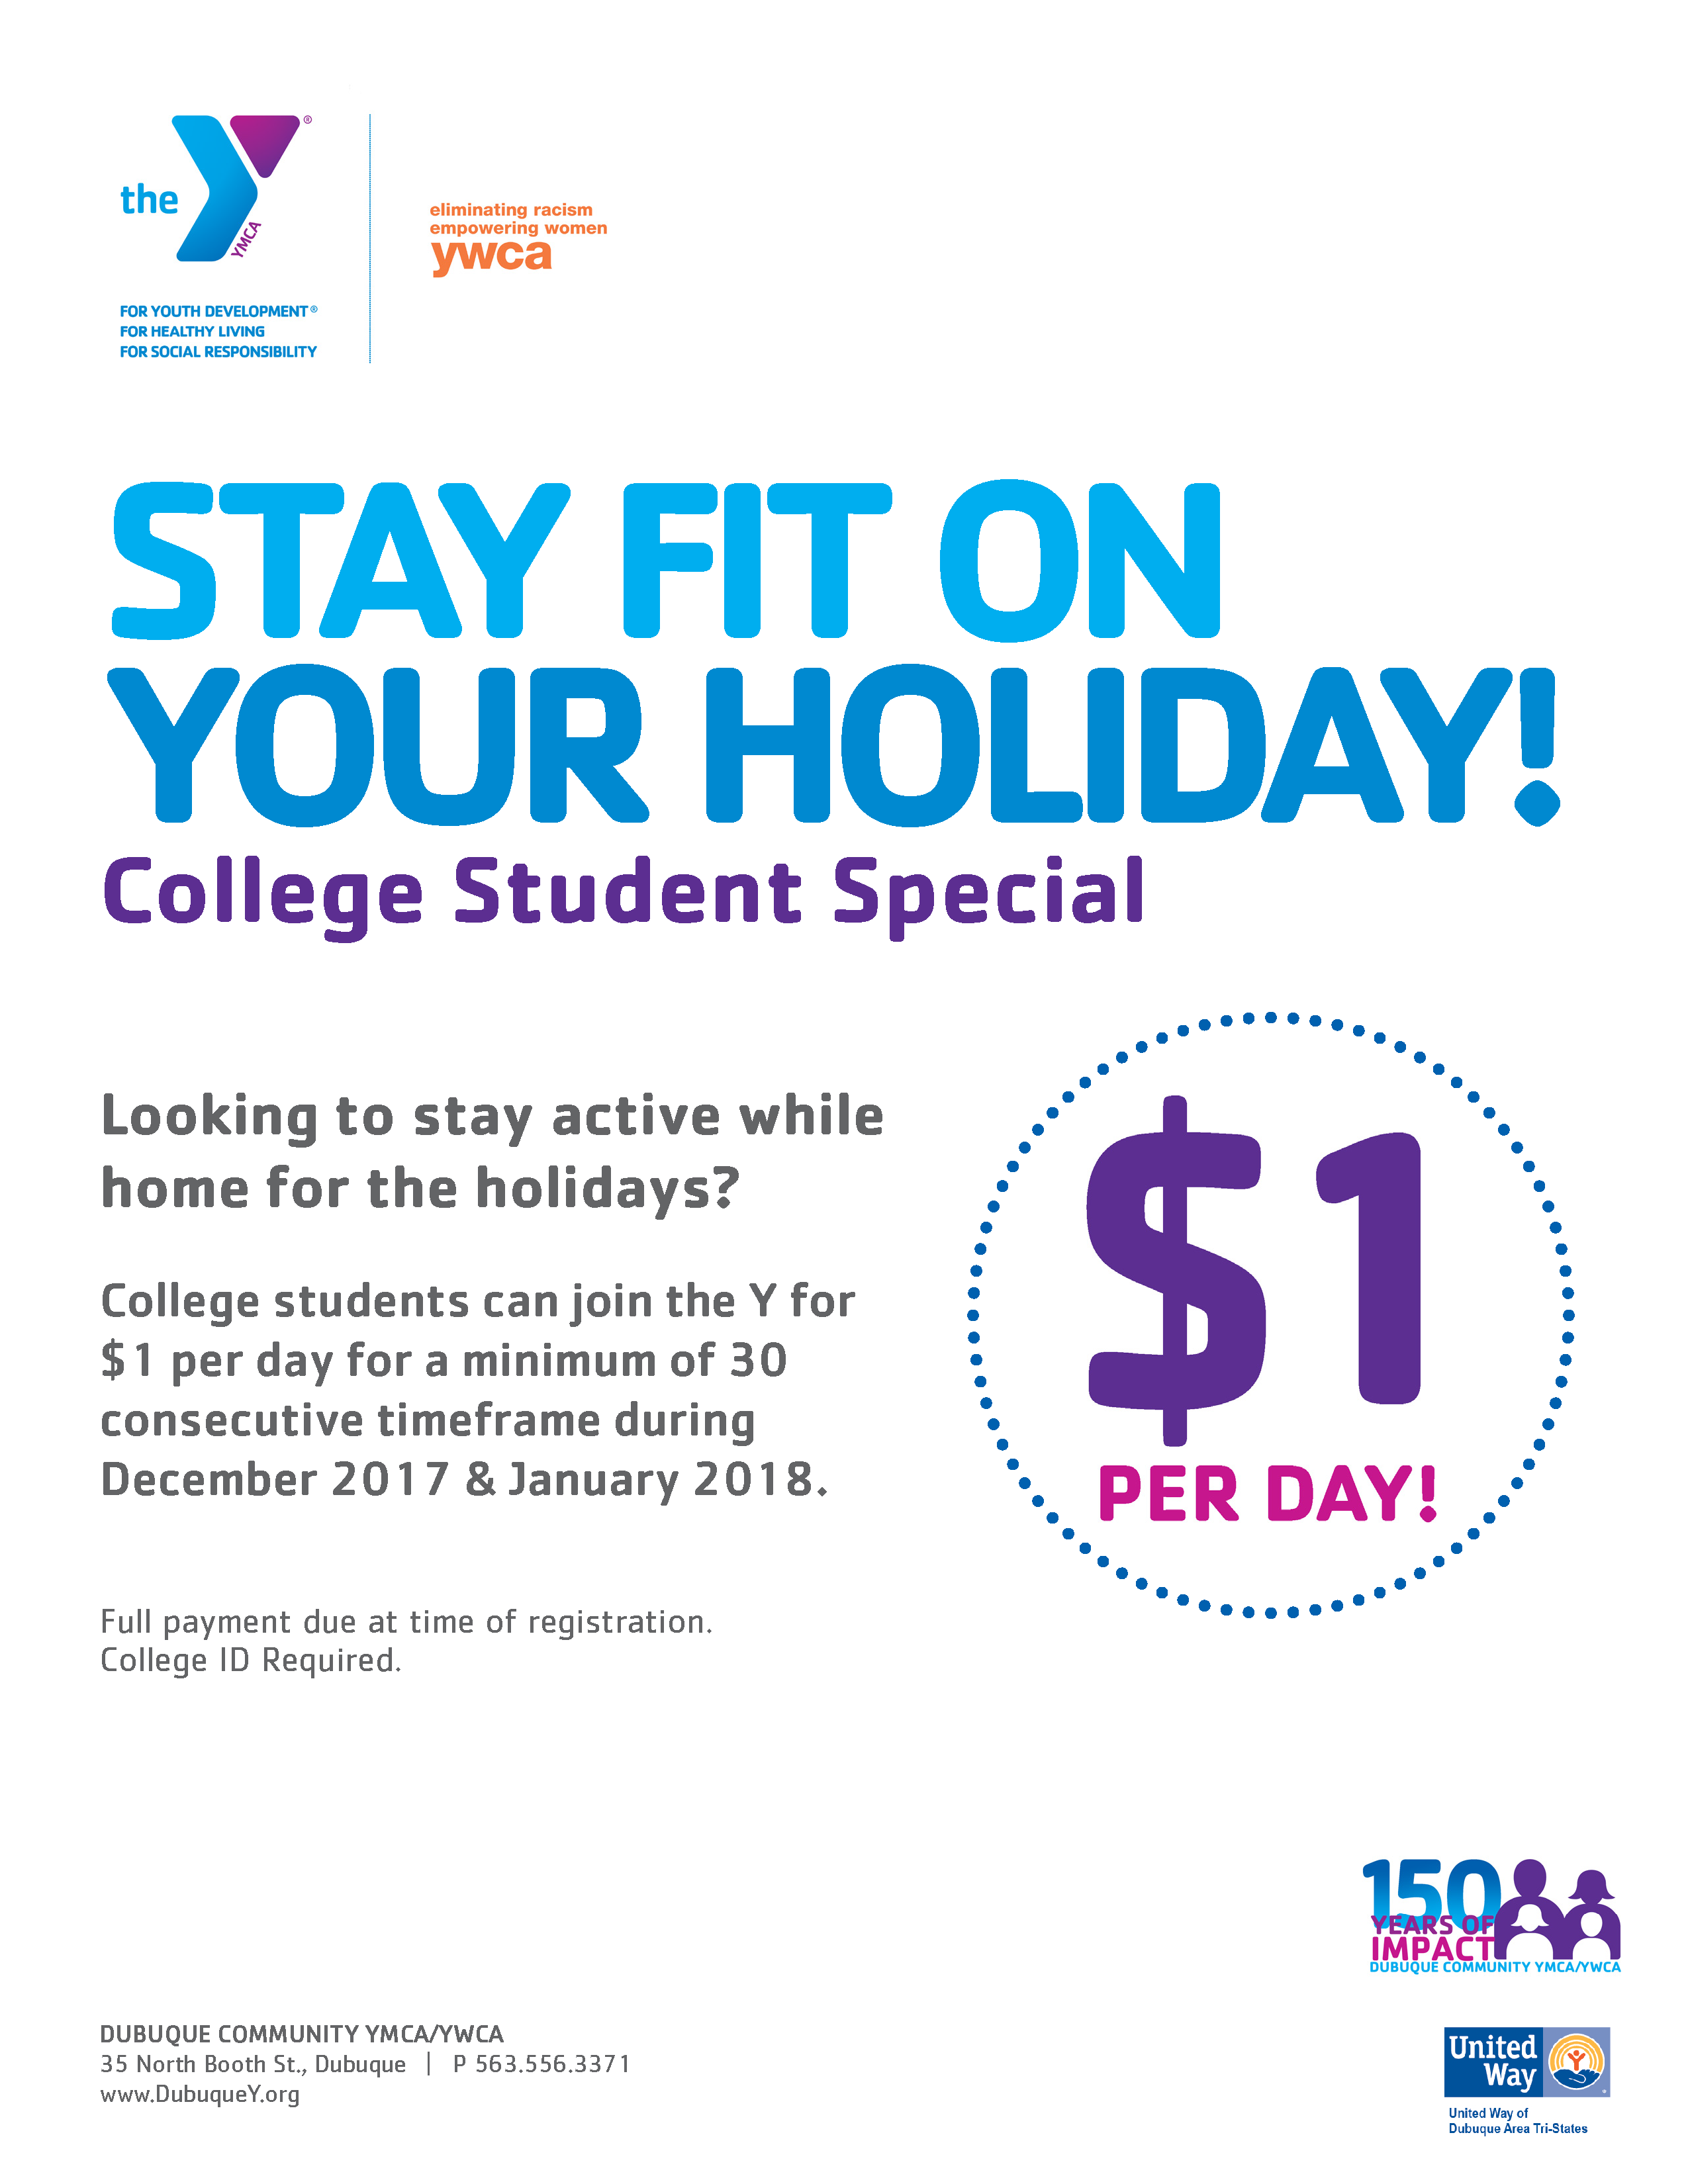 $1/Day Membership Special - Dubuque Community YMCA/YWCA